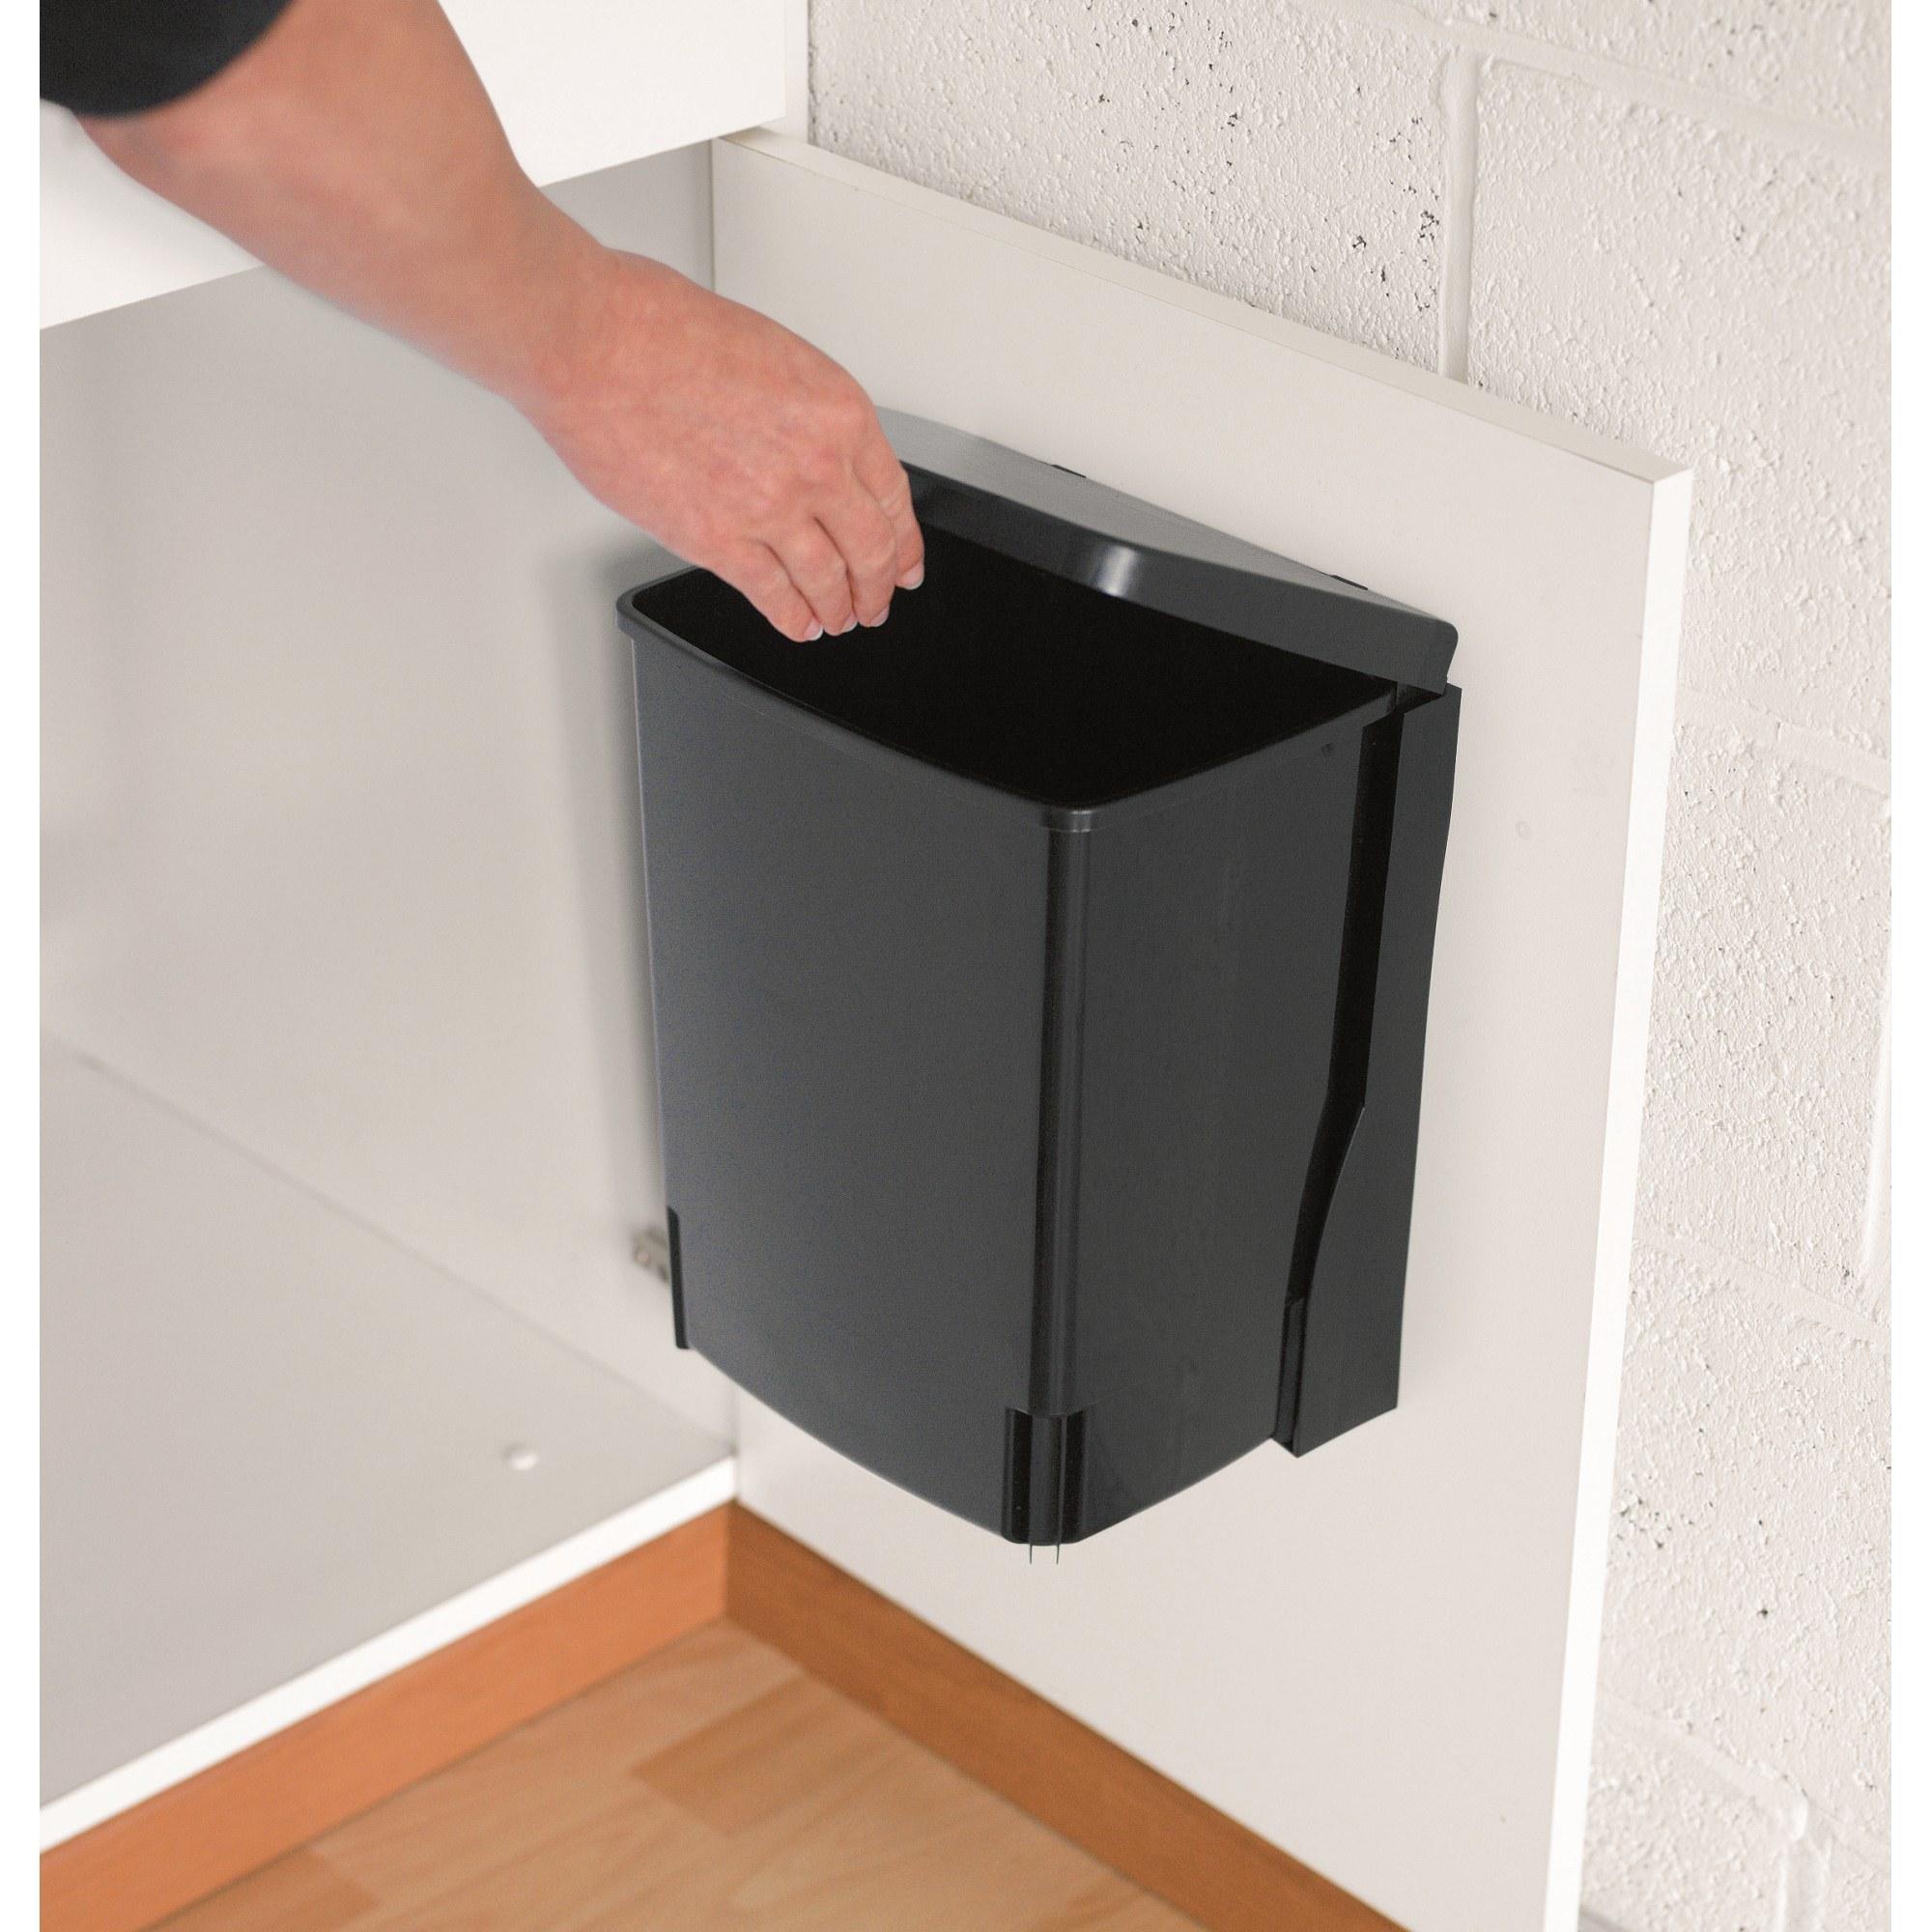 BRABANTIA Einbau-Mülleimer 10 Liter BLACK | eBay